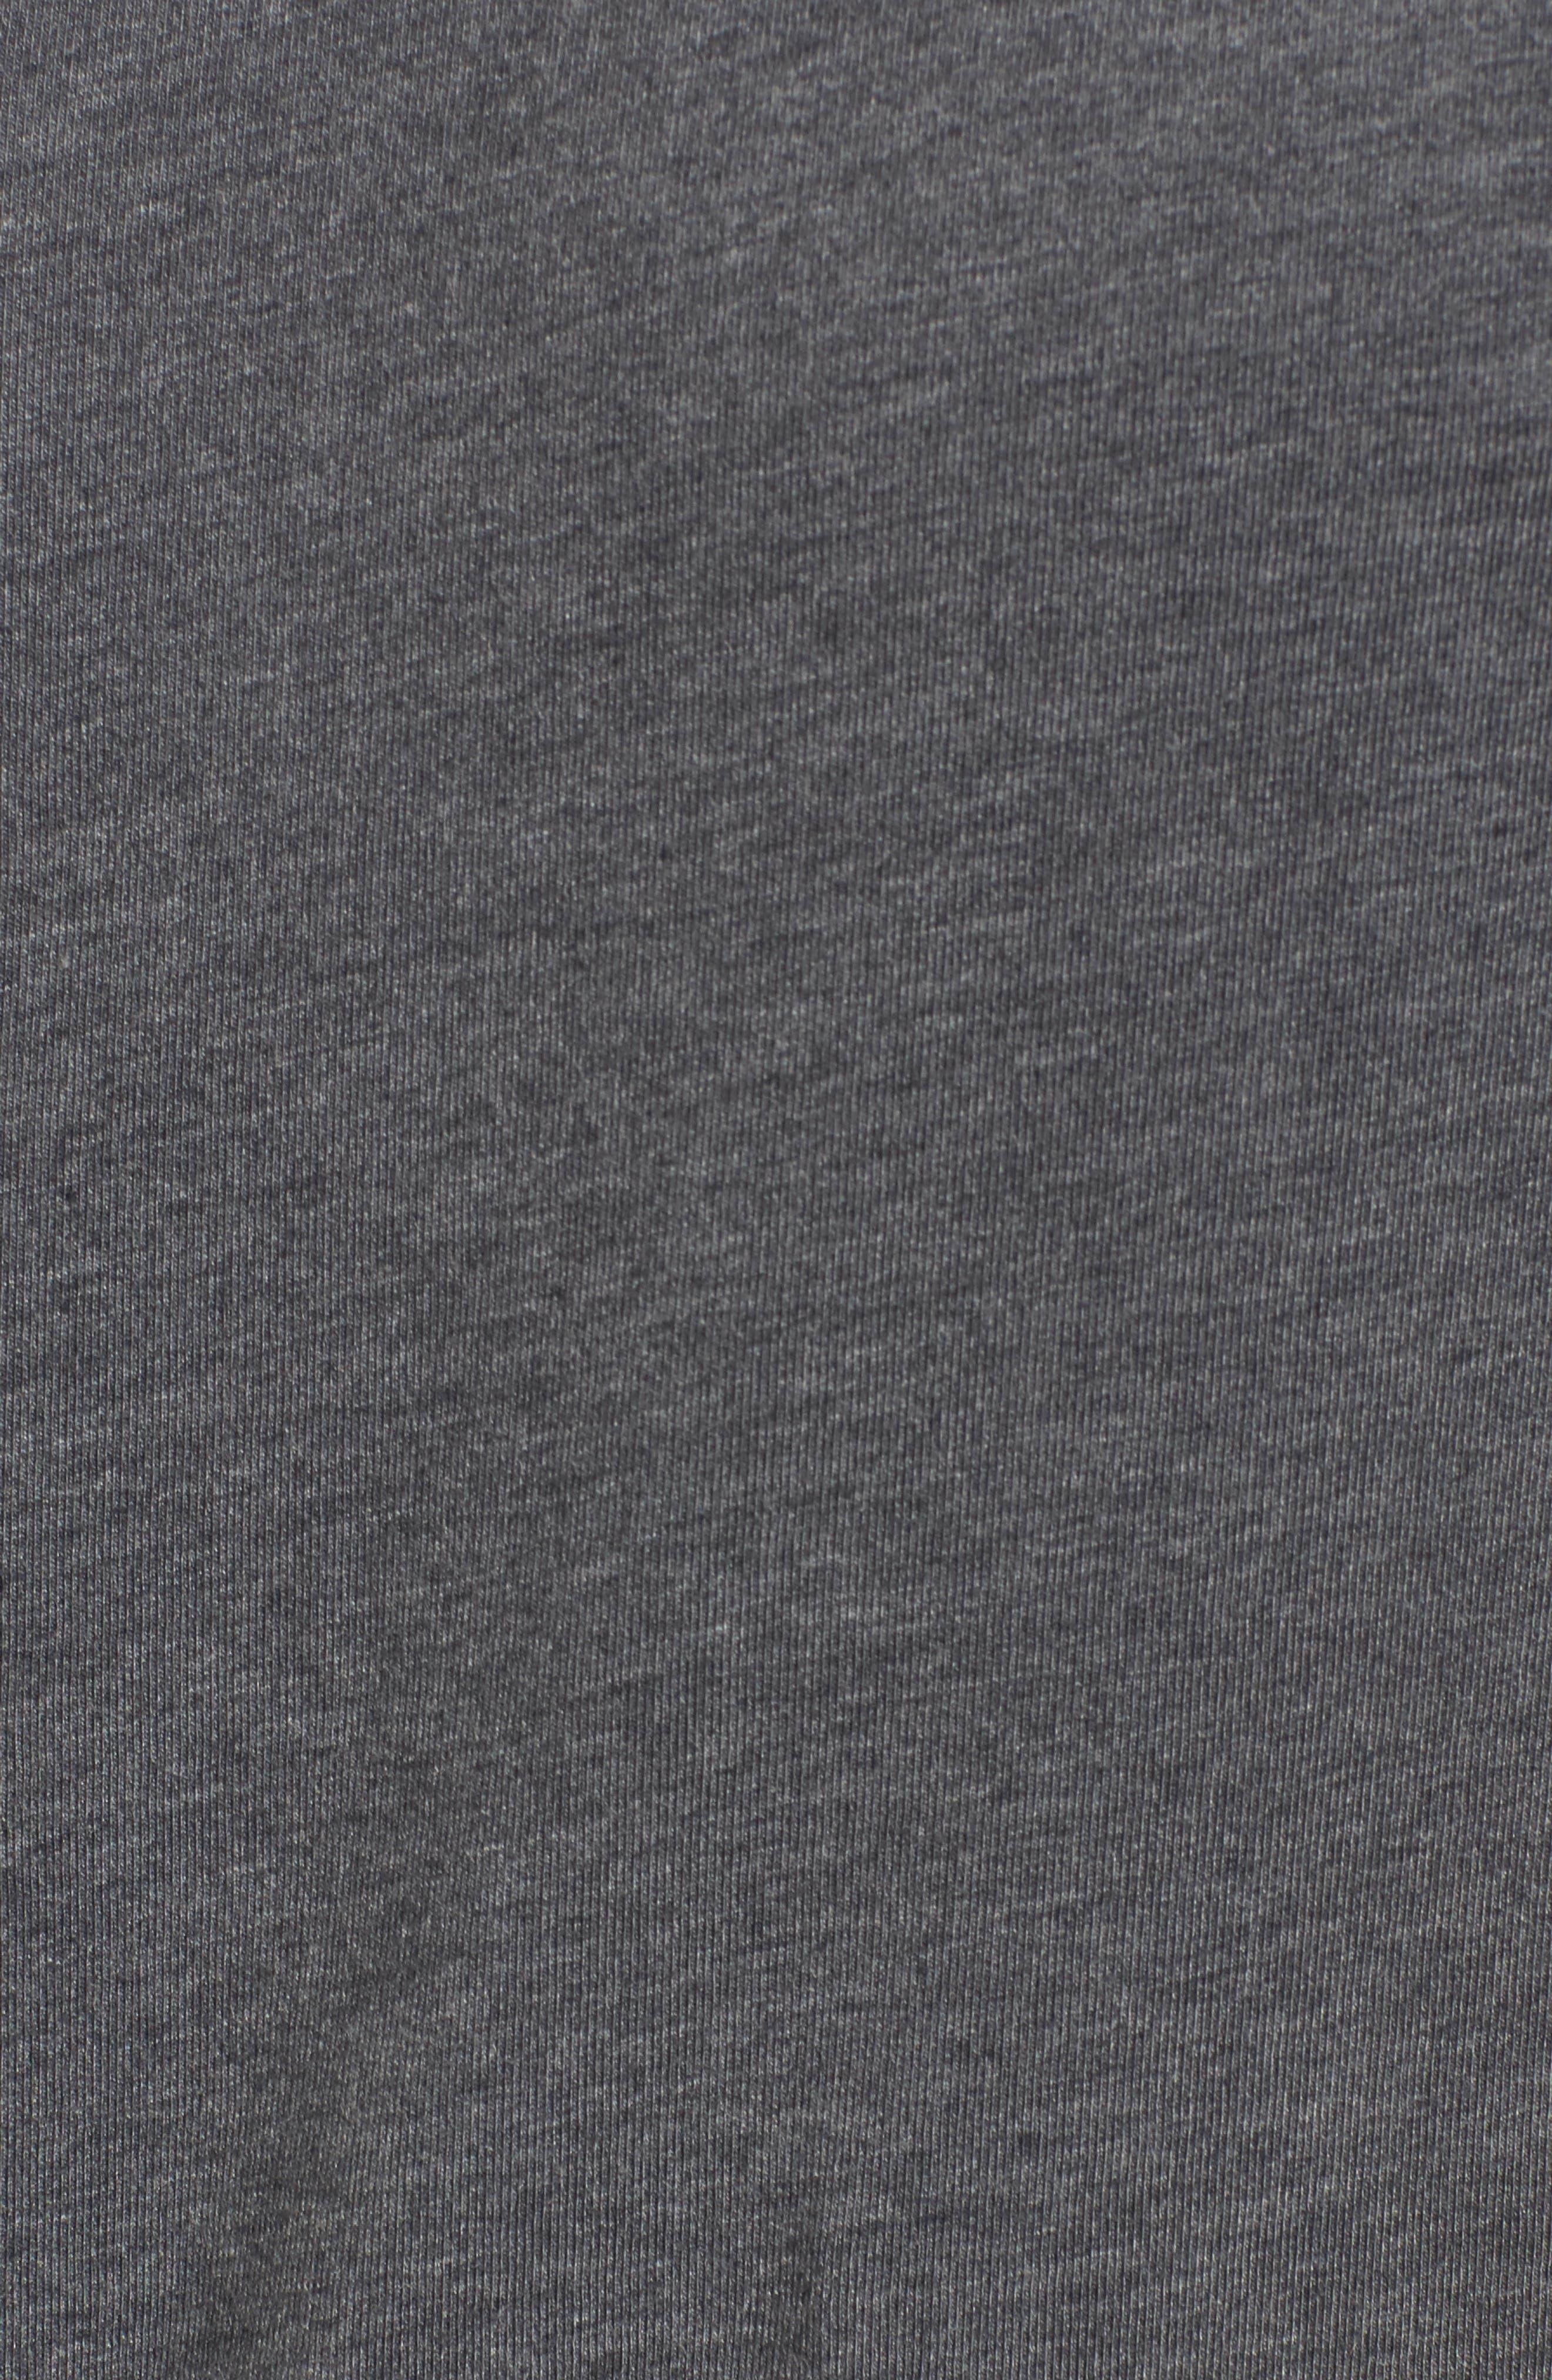 TASC PERFORMANCE, Legacy Crewneck Sweatshirt, Alternate thumbnail 5, color, BLACK HEATHER